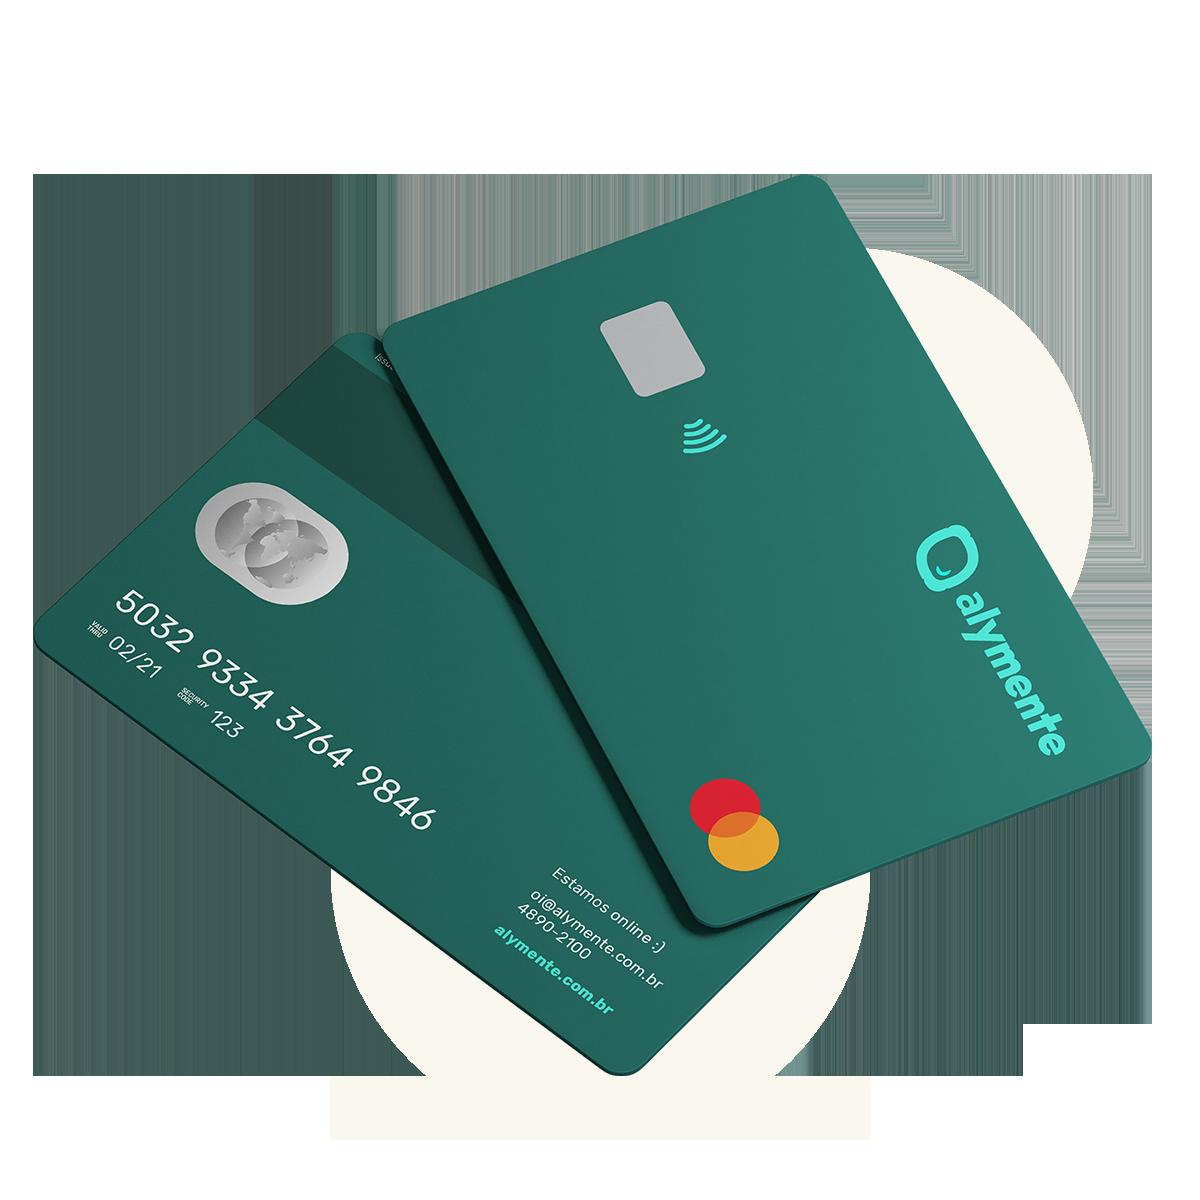 A green Alymente credit card